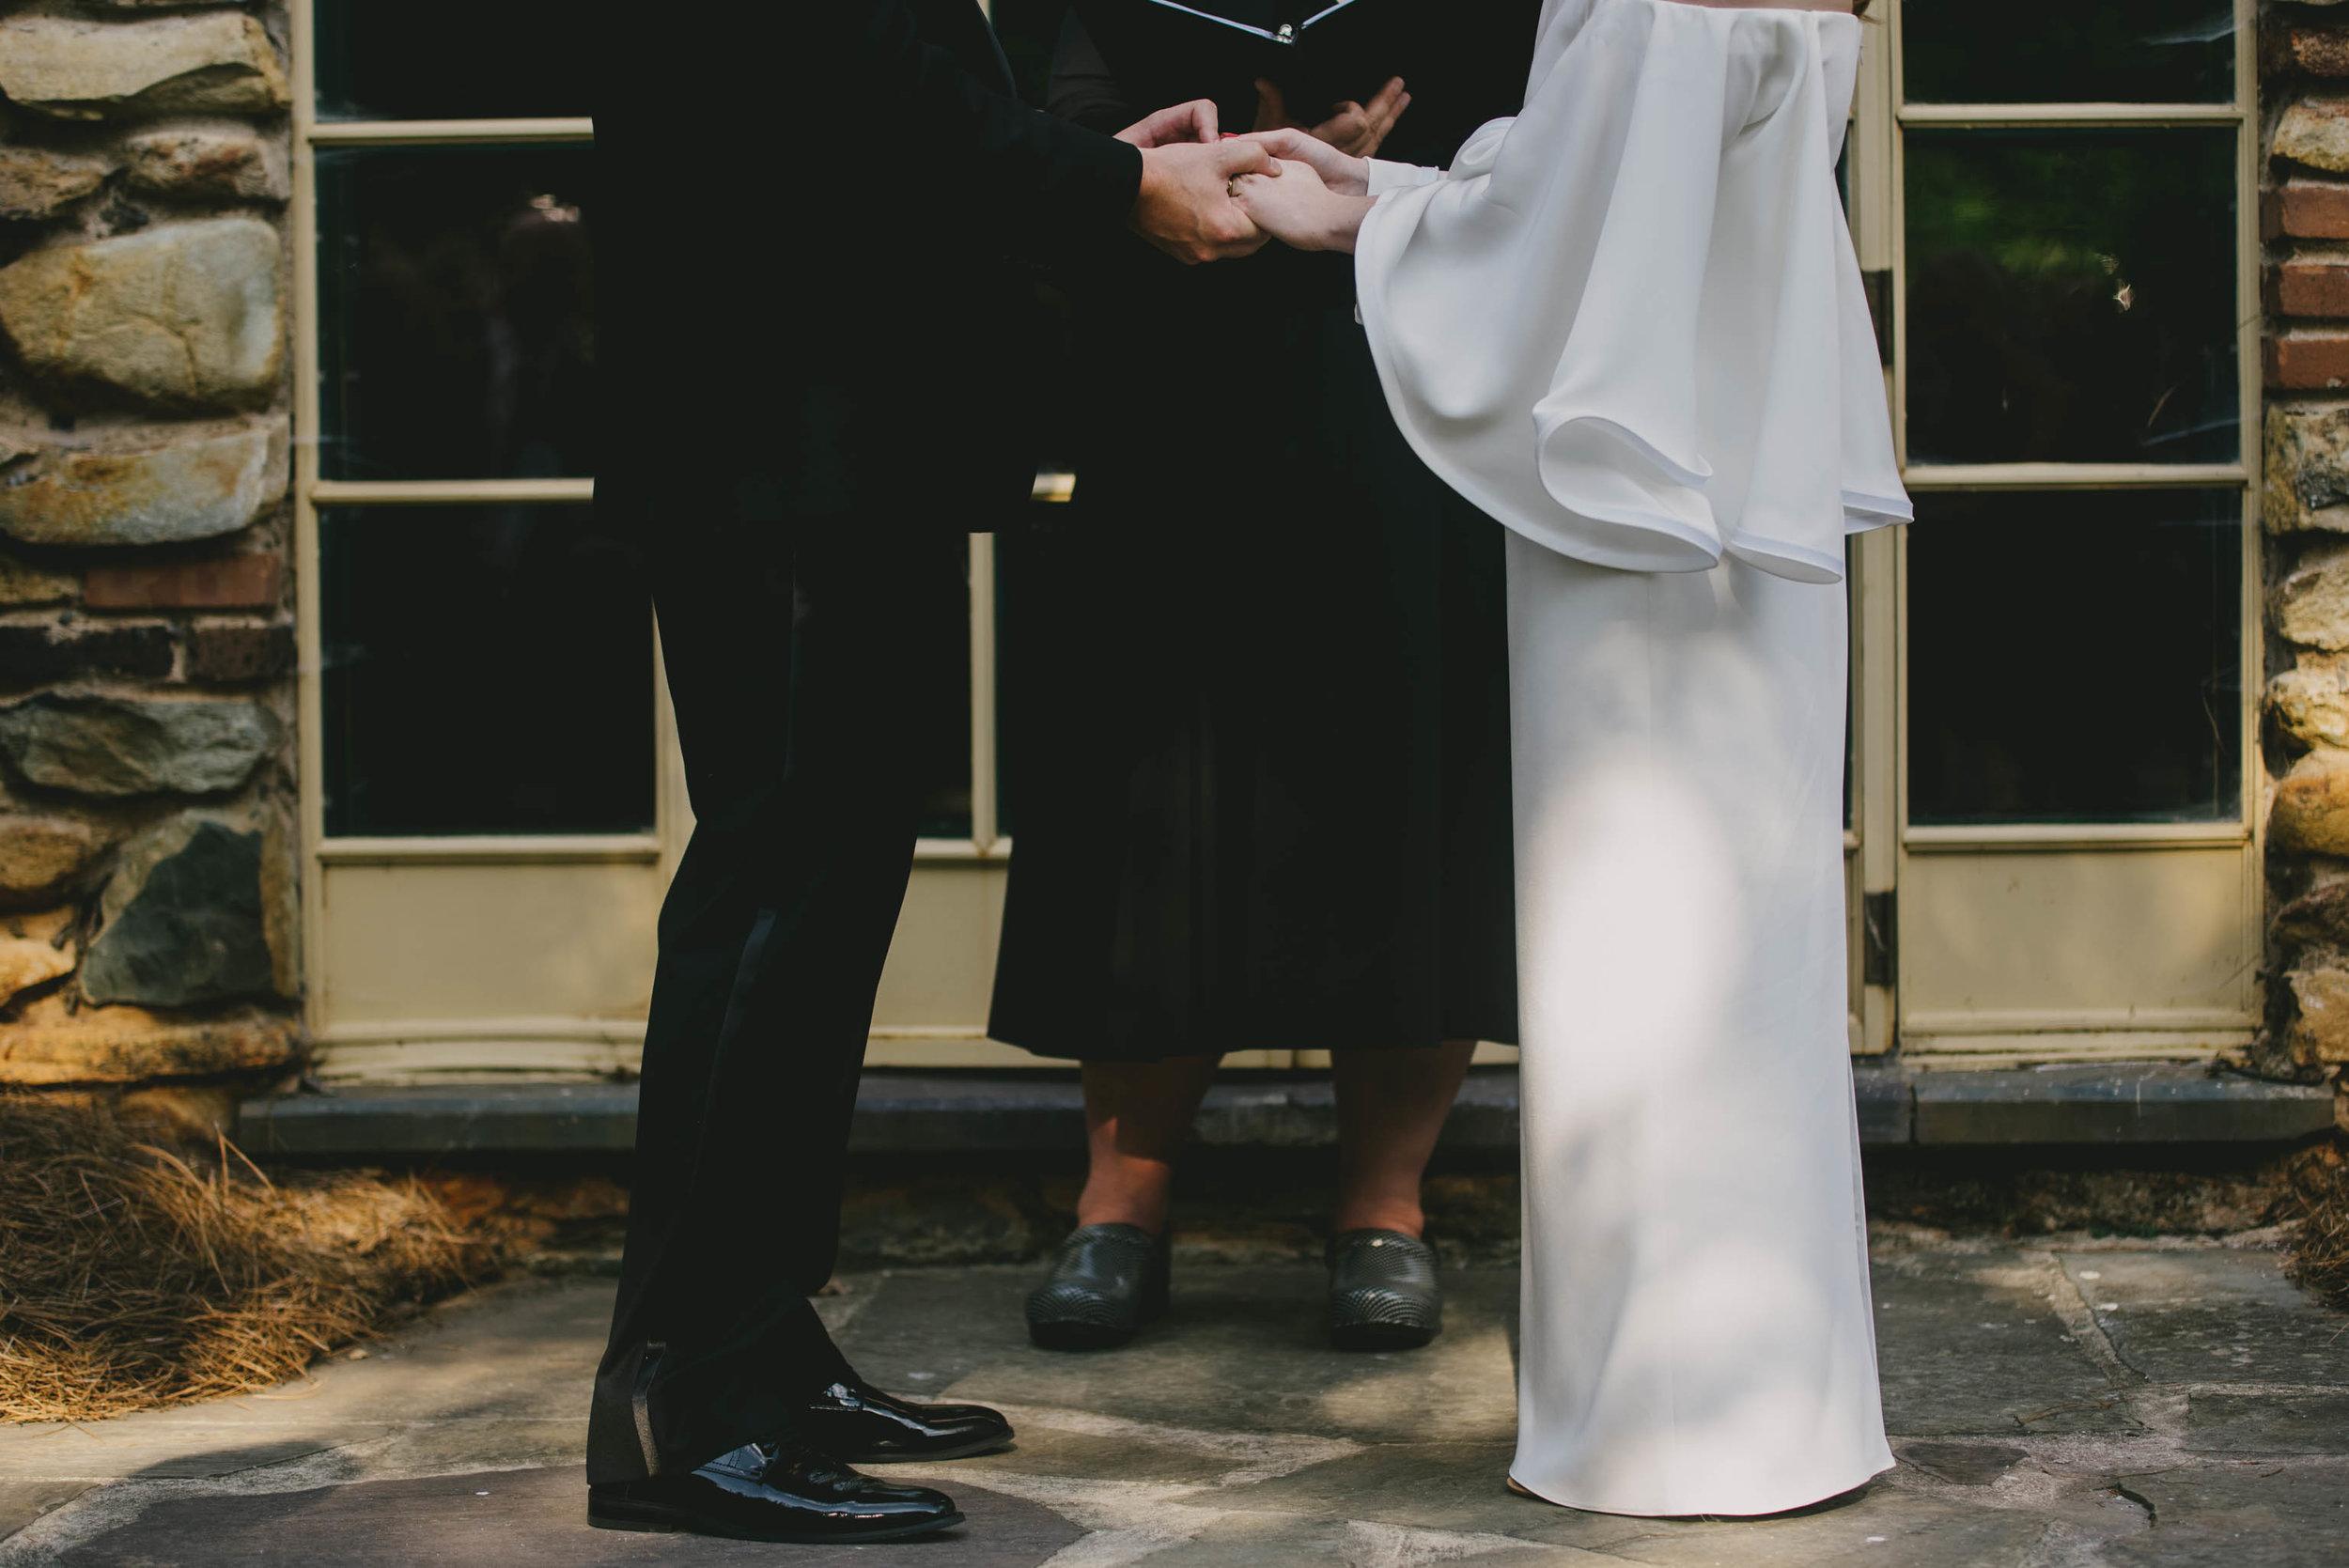 houghton-bride-and-her-groom-photo-exchanging-rings.jpg